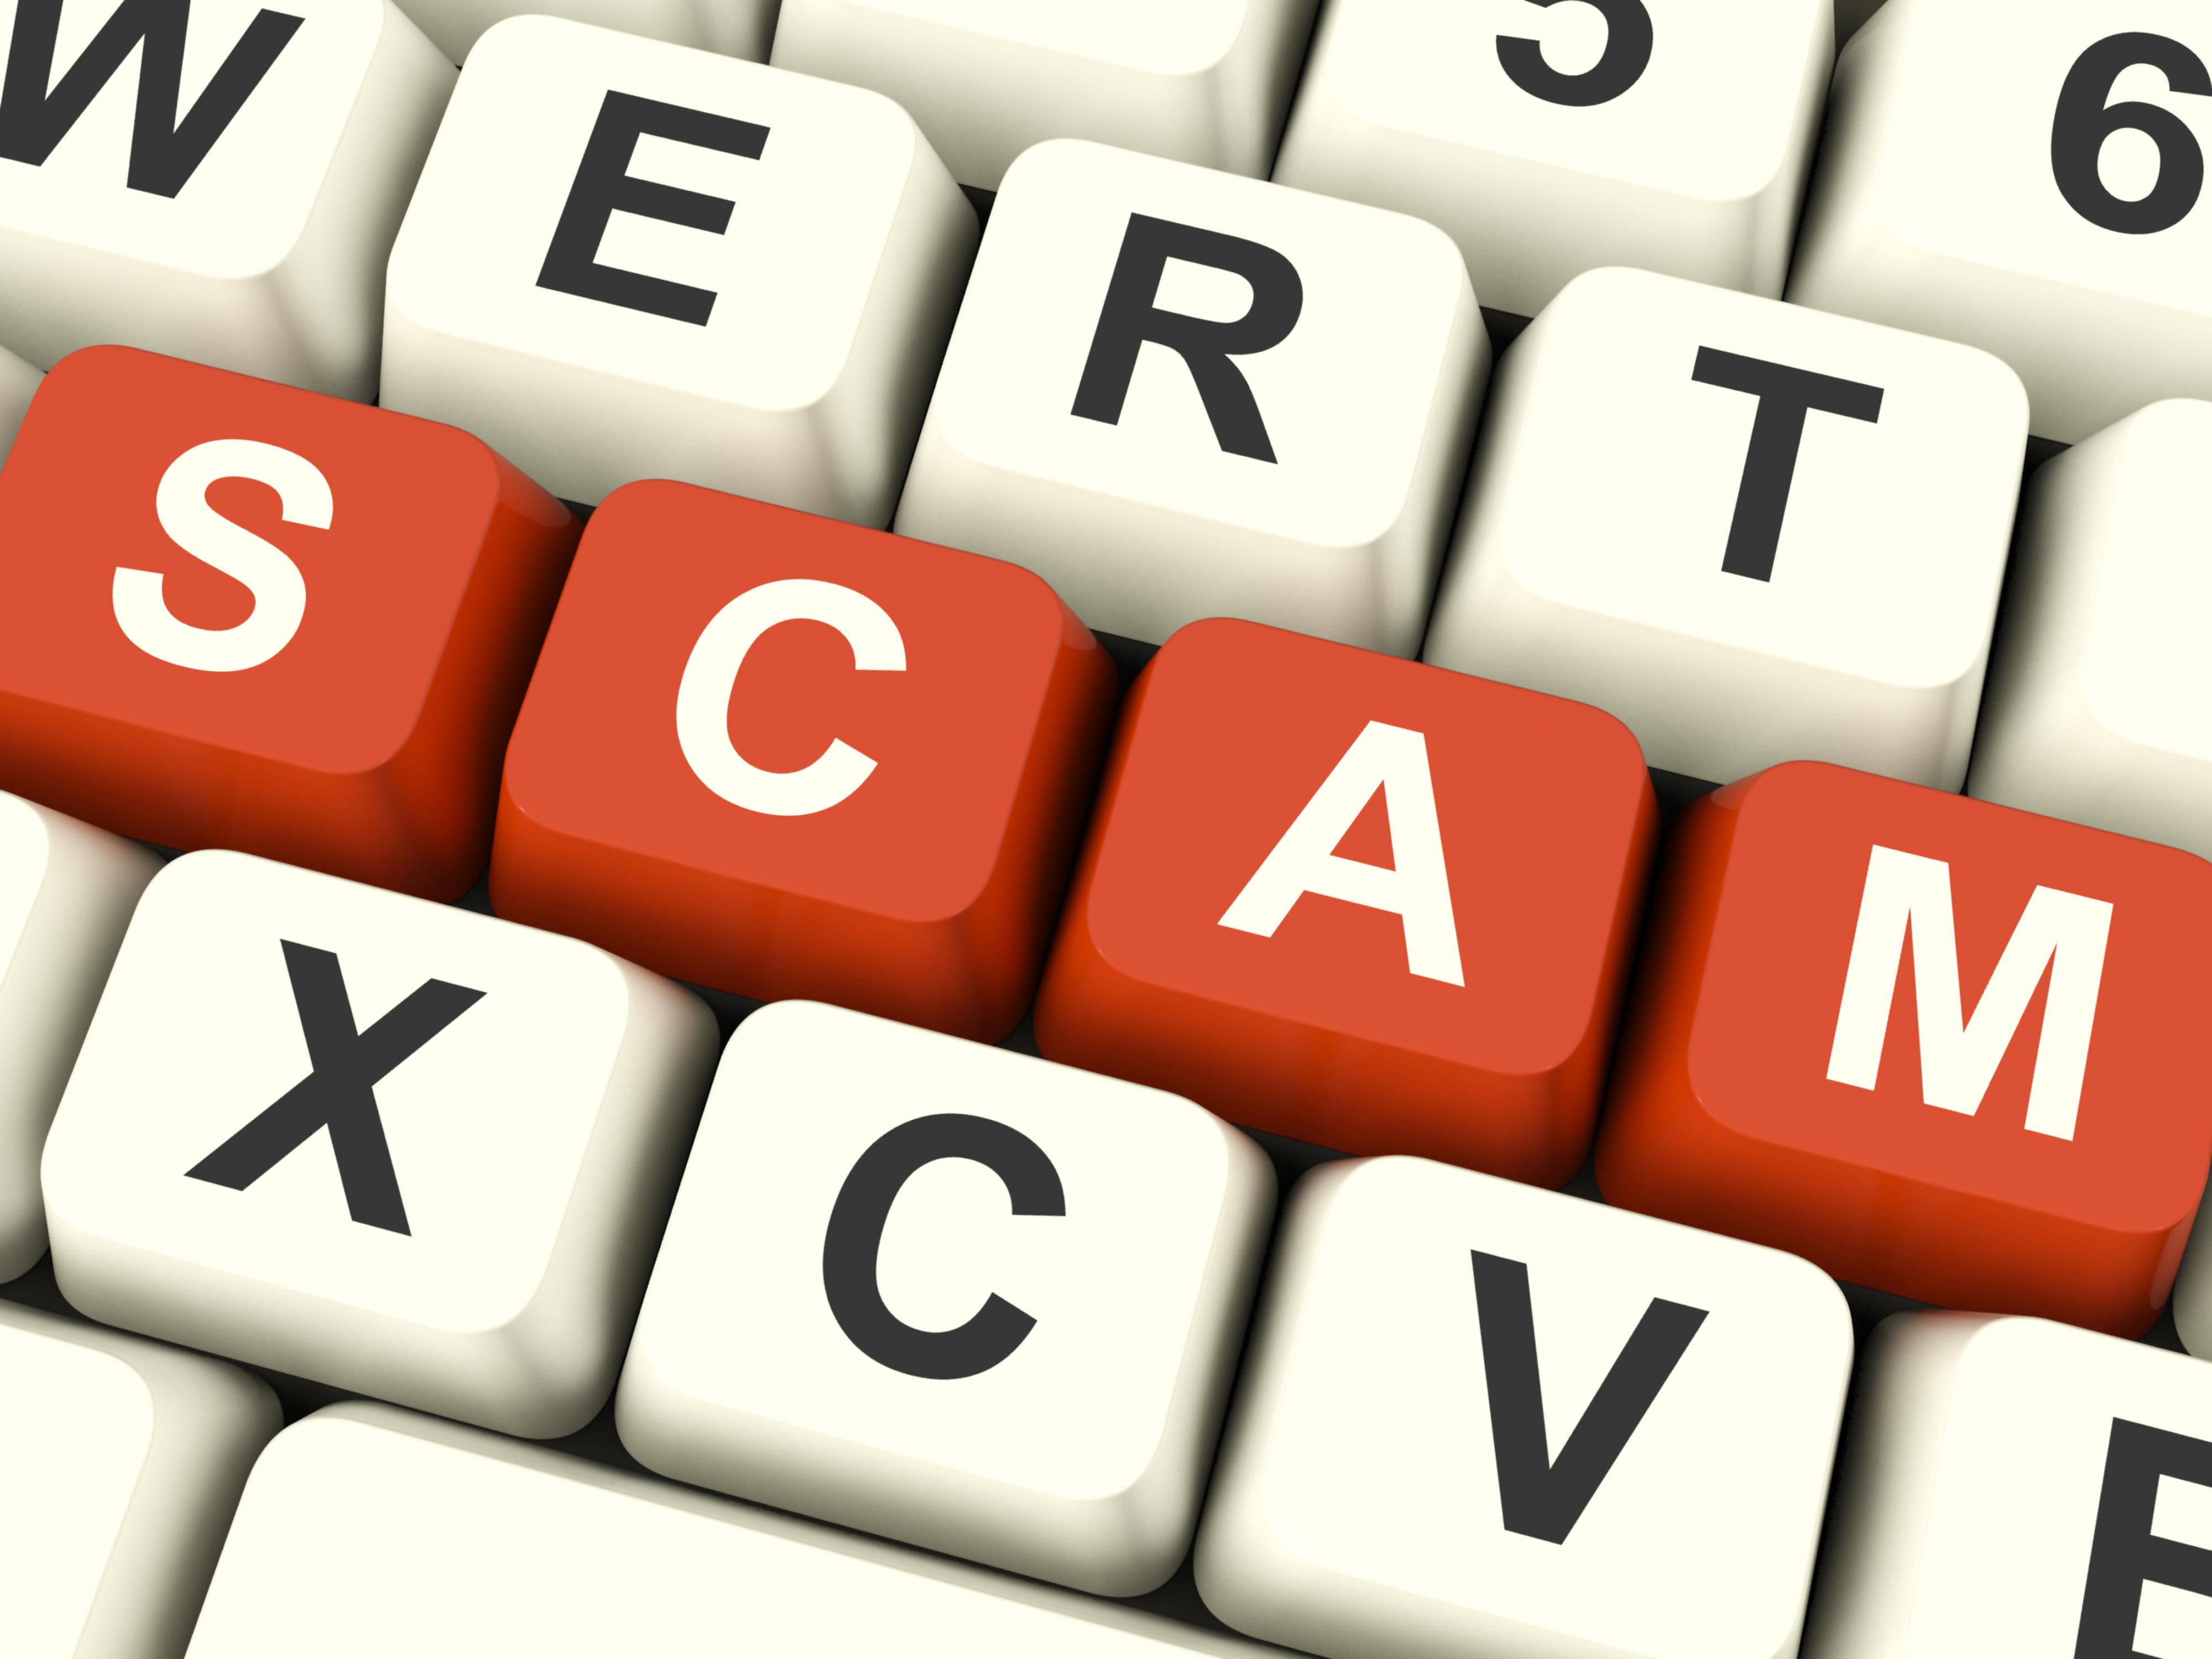 scam-computer-keys-showing-swindles-and-fraudzjdawfp.jpg